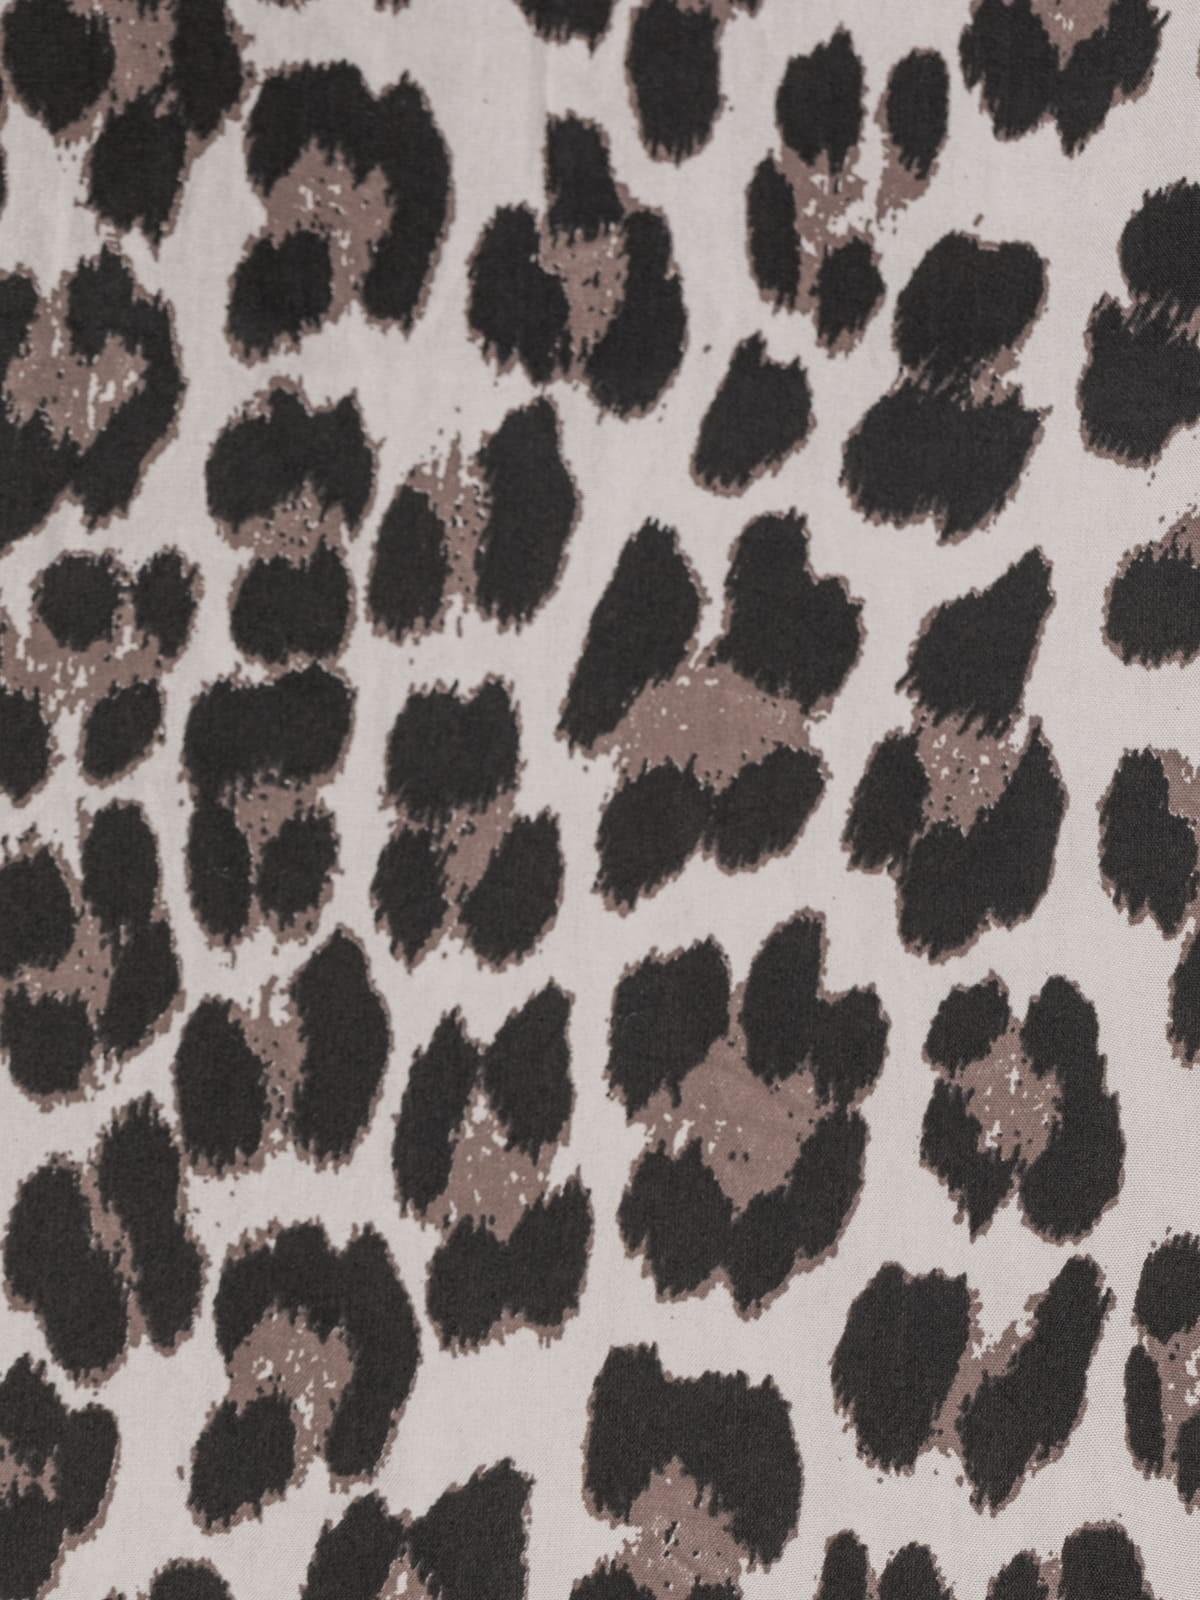 Woman Animal print button shirt Beige